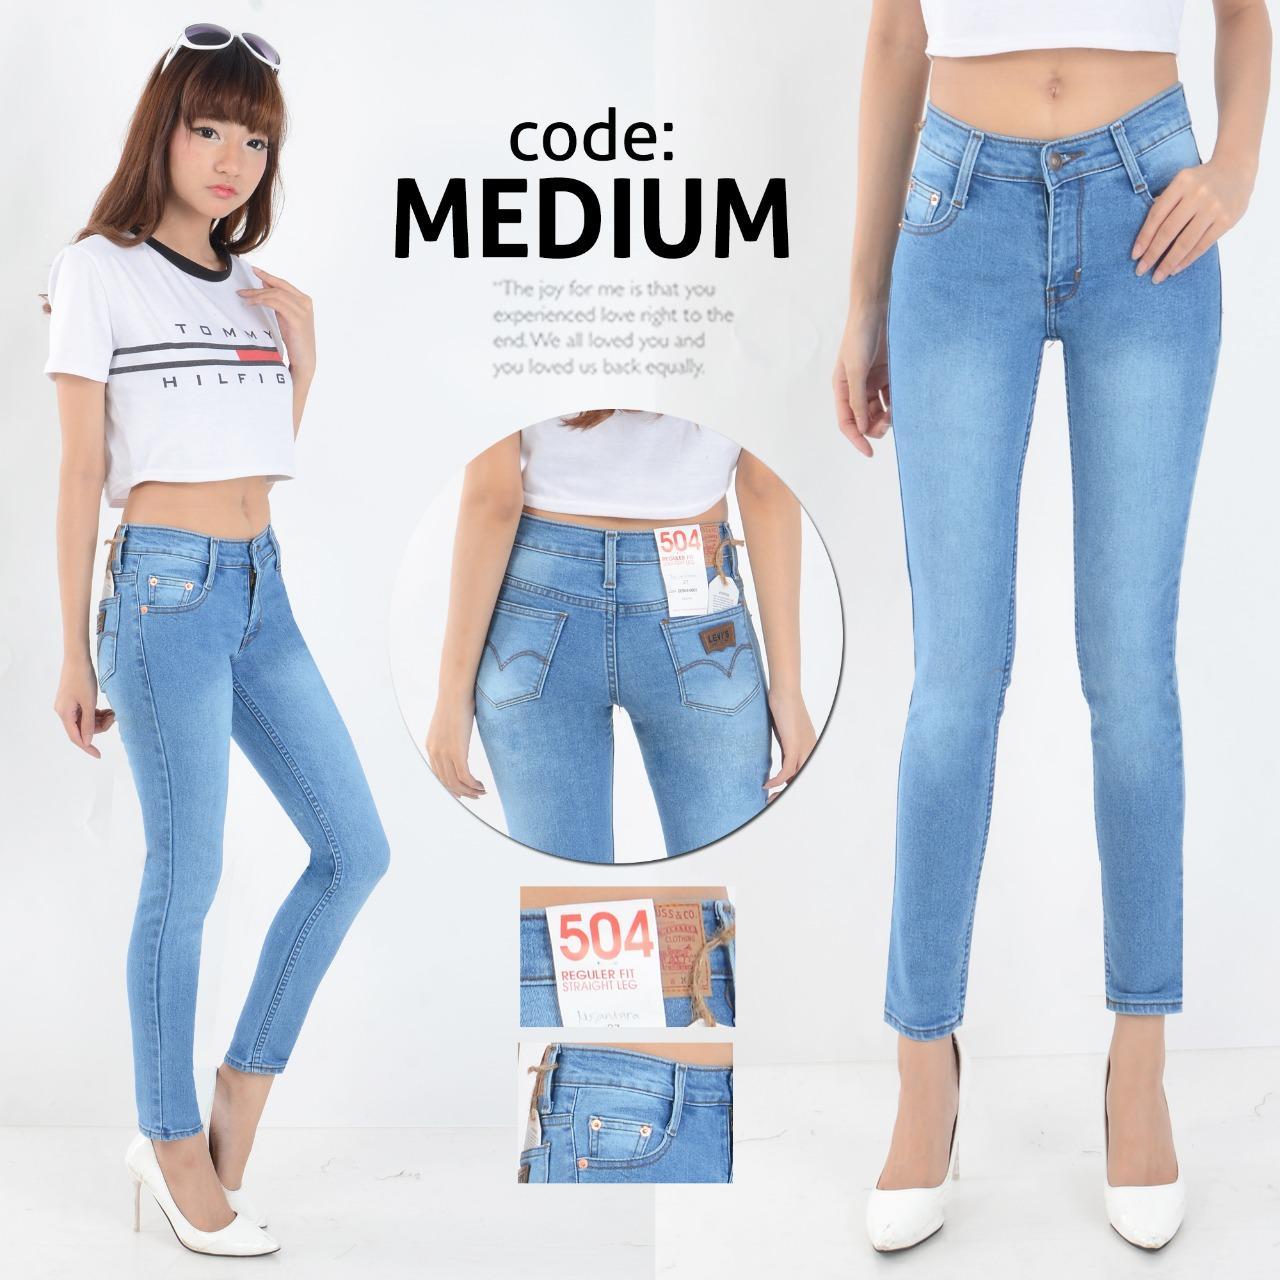 Nusantara Jeans - Celana Jeans Wanita Skinny Ripped Ristleting Erigo Berbahan Denim